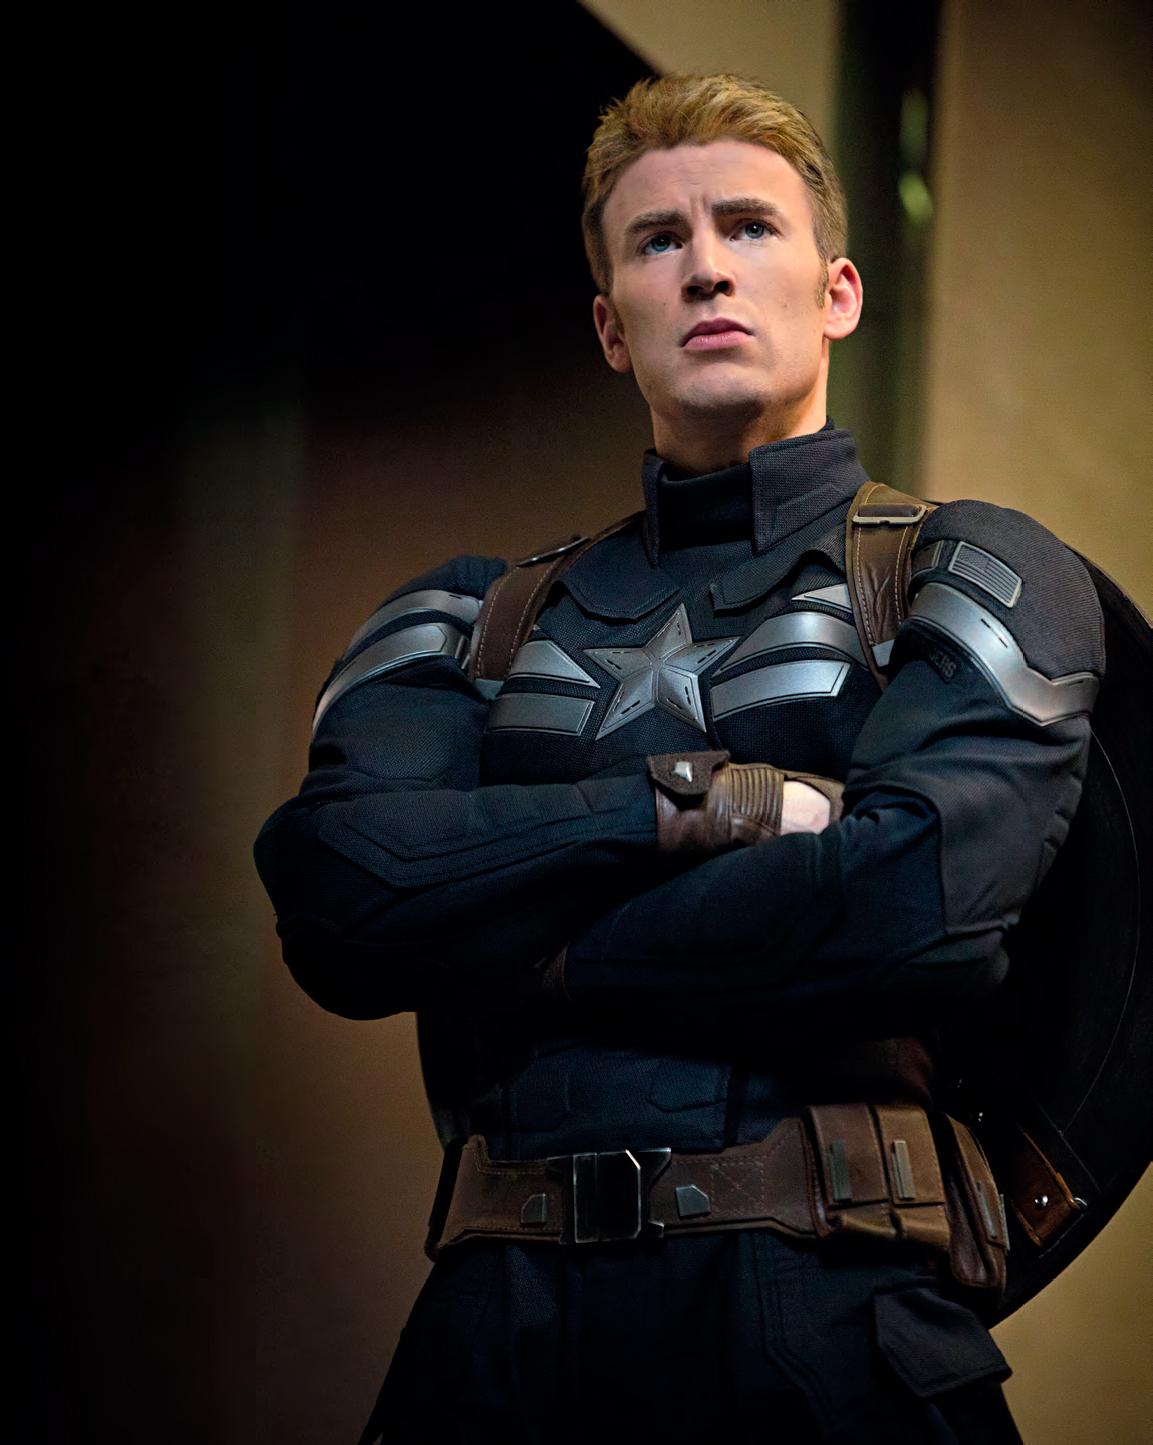 Captain America - Chris Evans